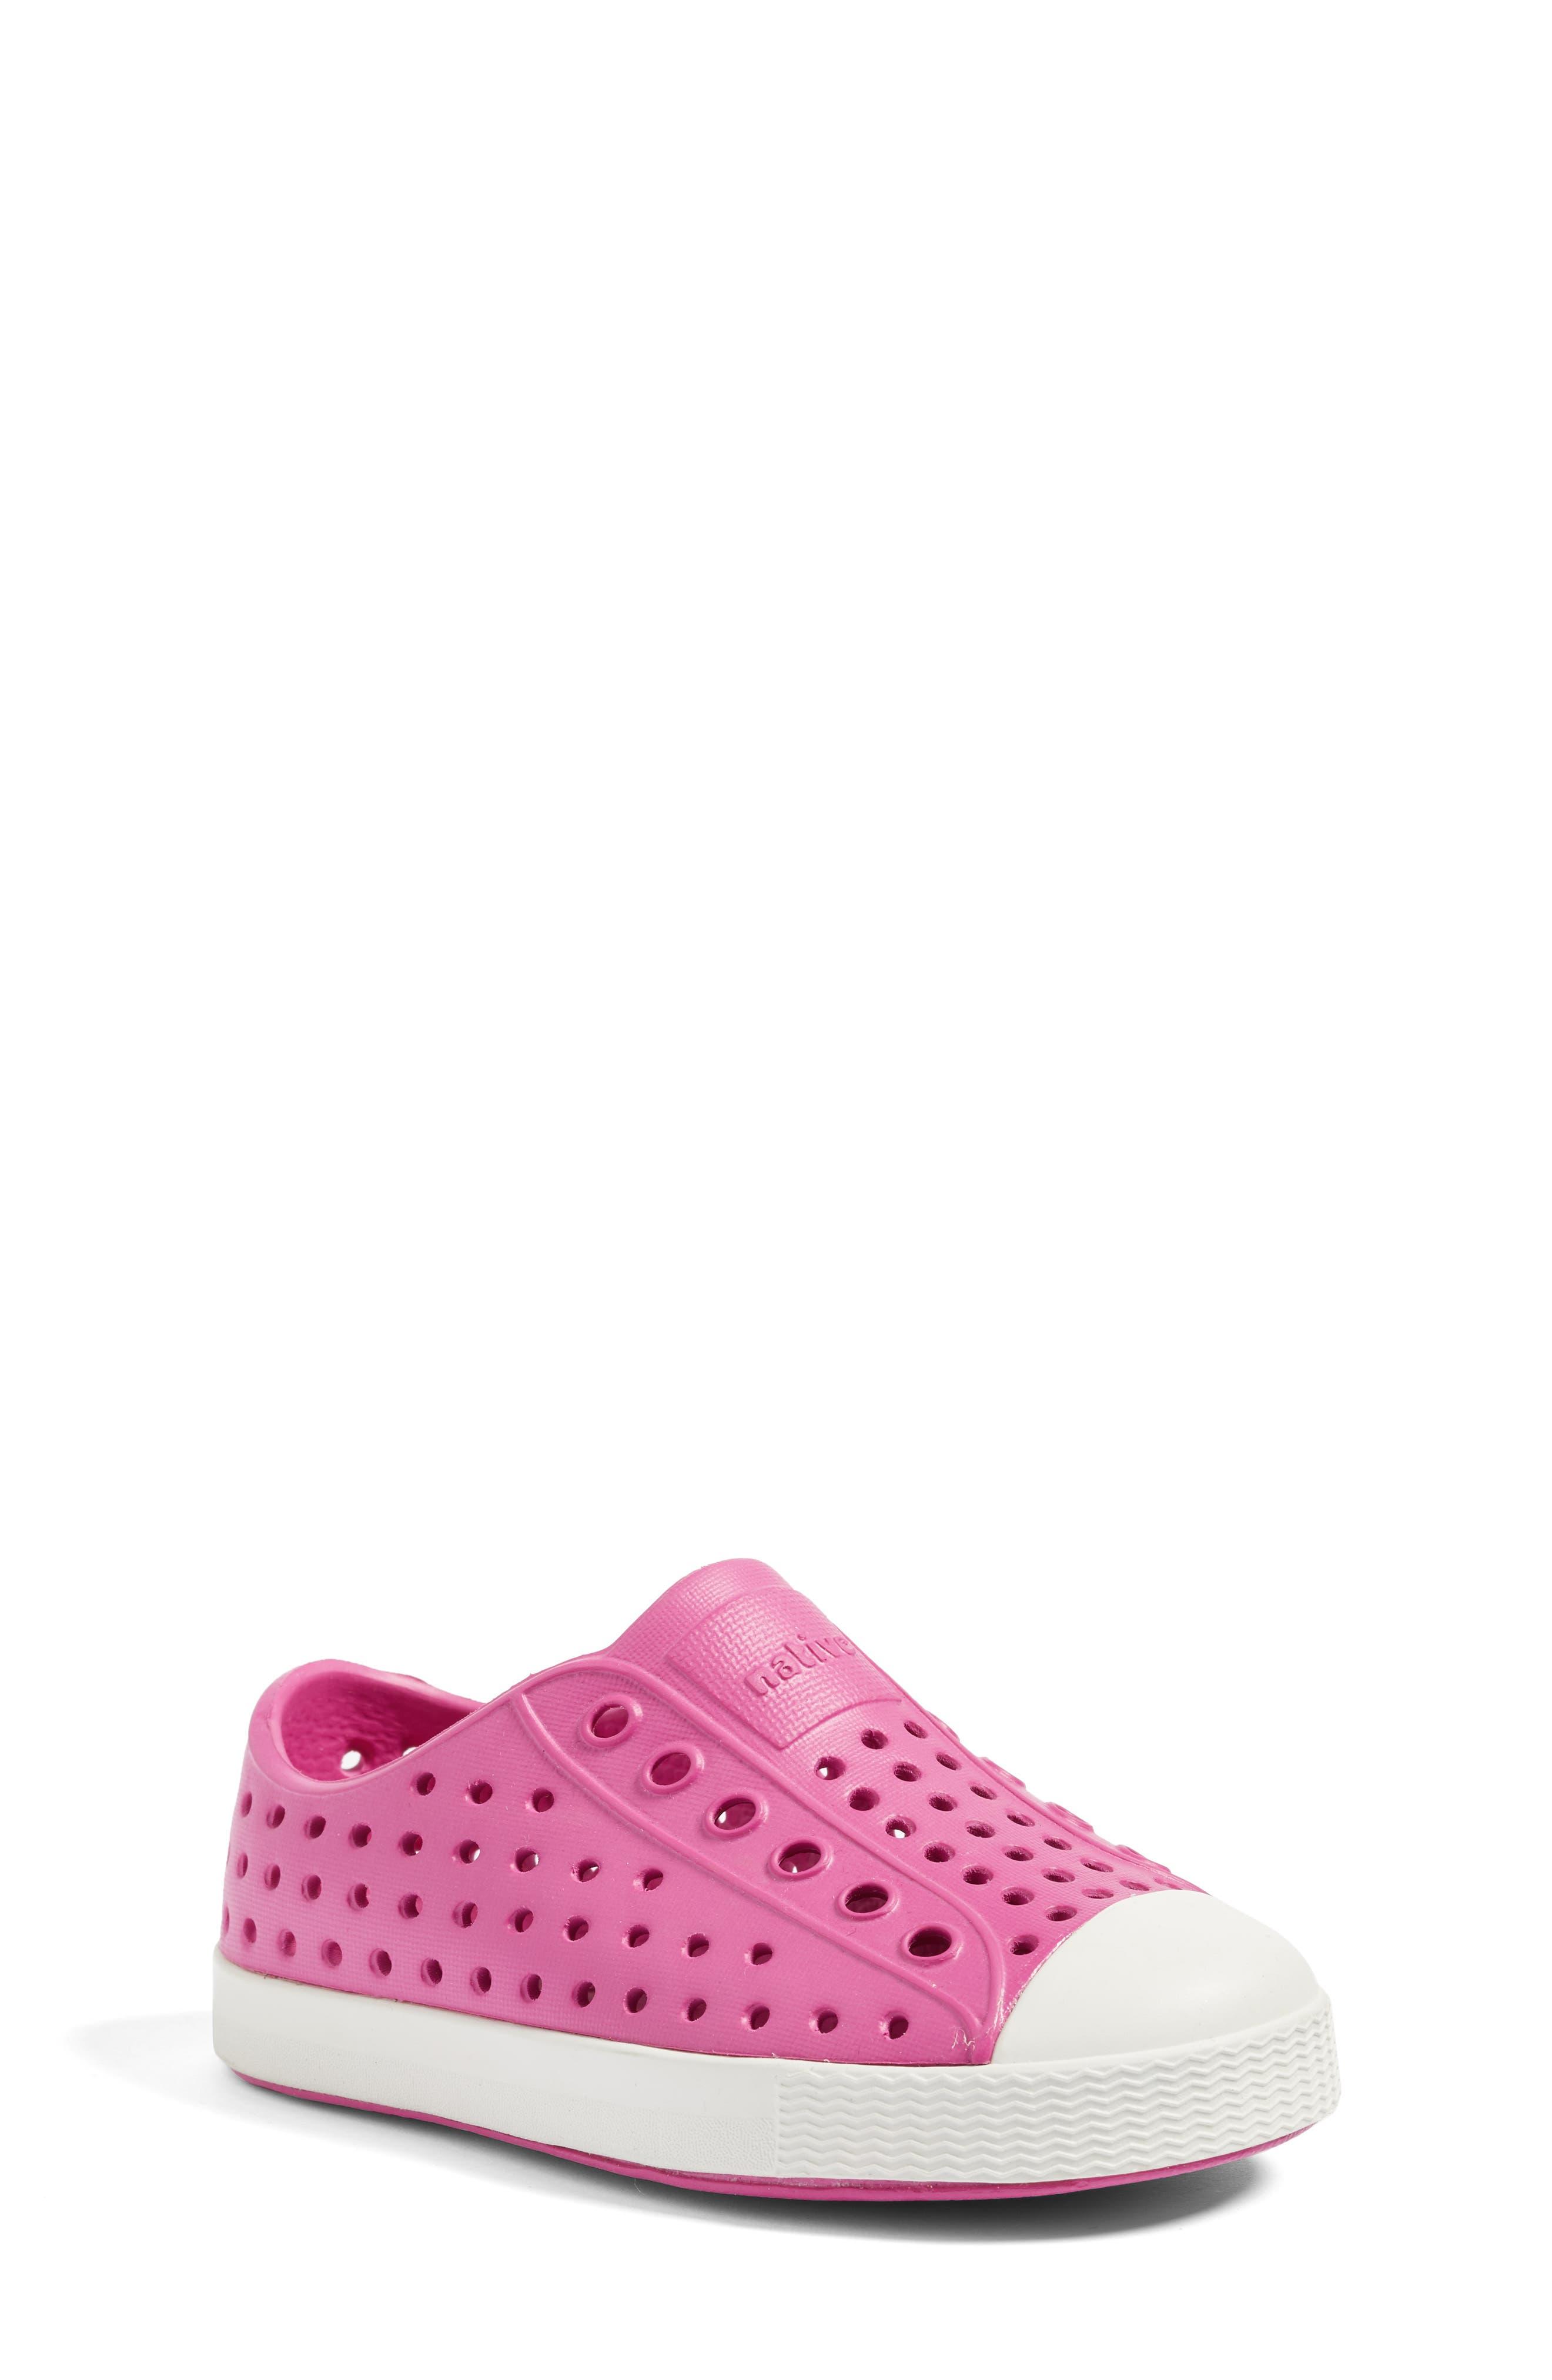 Native Shoes 'Jefferson' Slip-On Sneaker (Baby, Walker, Toddler, Little Kid & Big Kid)